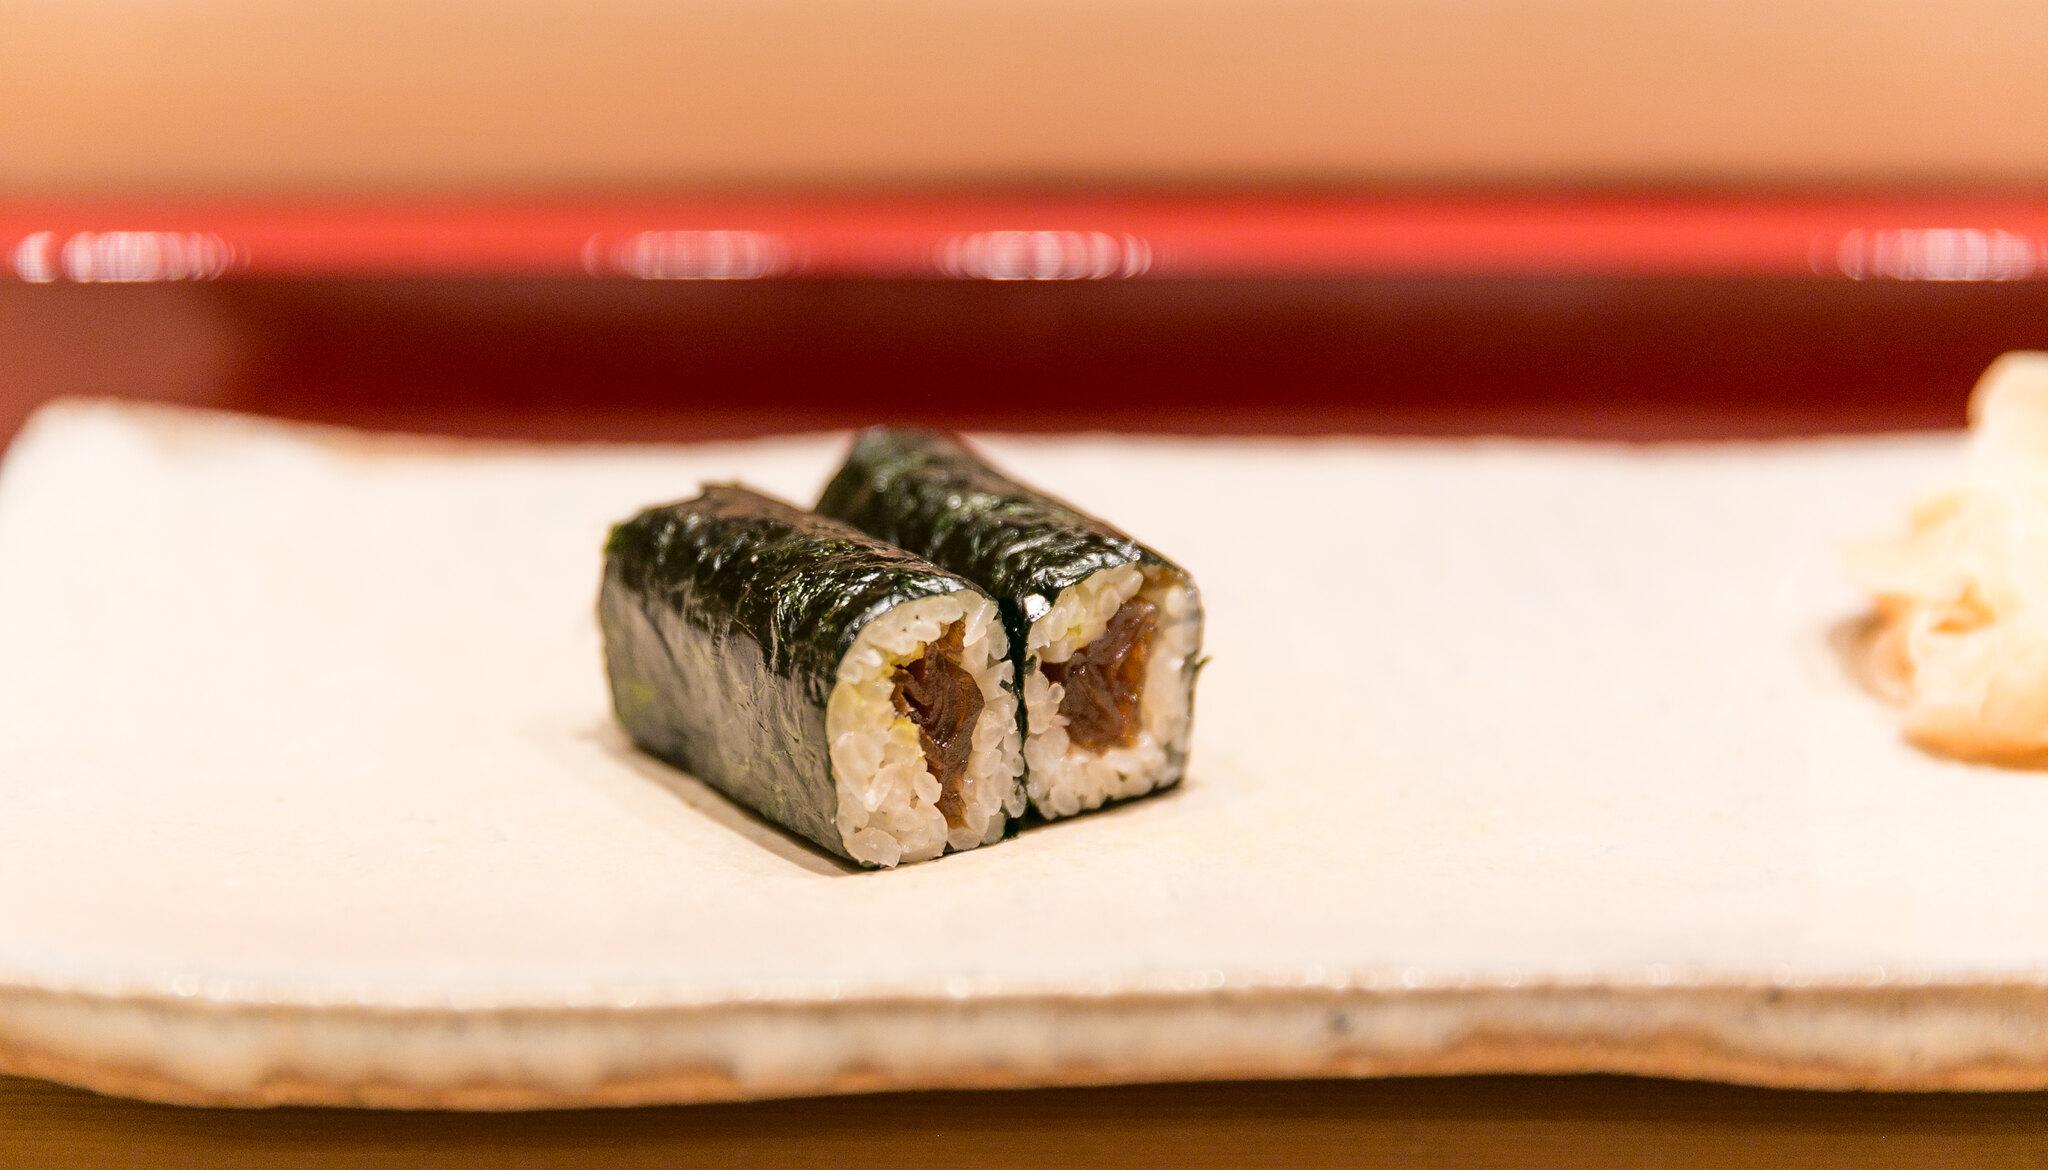 3. Dried Gourd Sushi Roll (Kanpyo Maki)